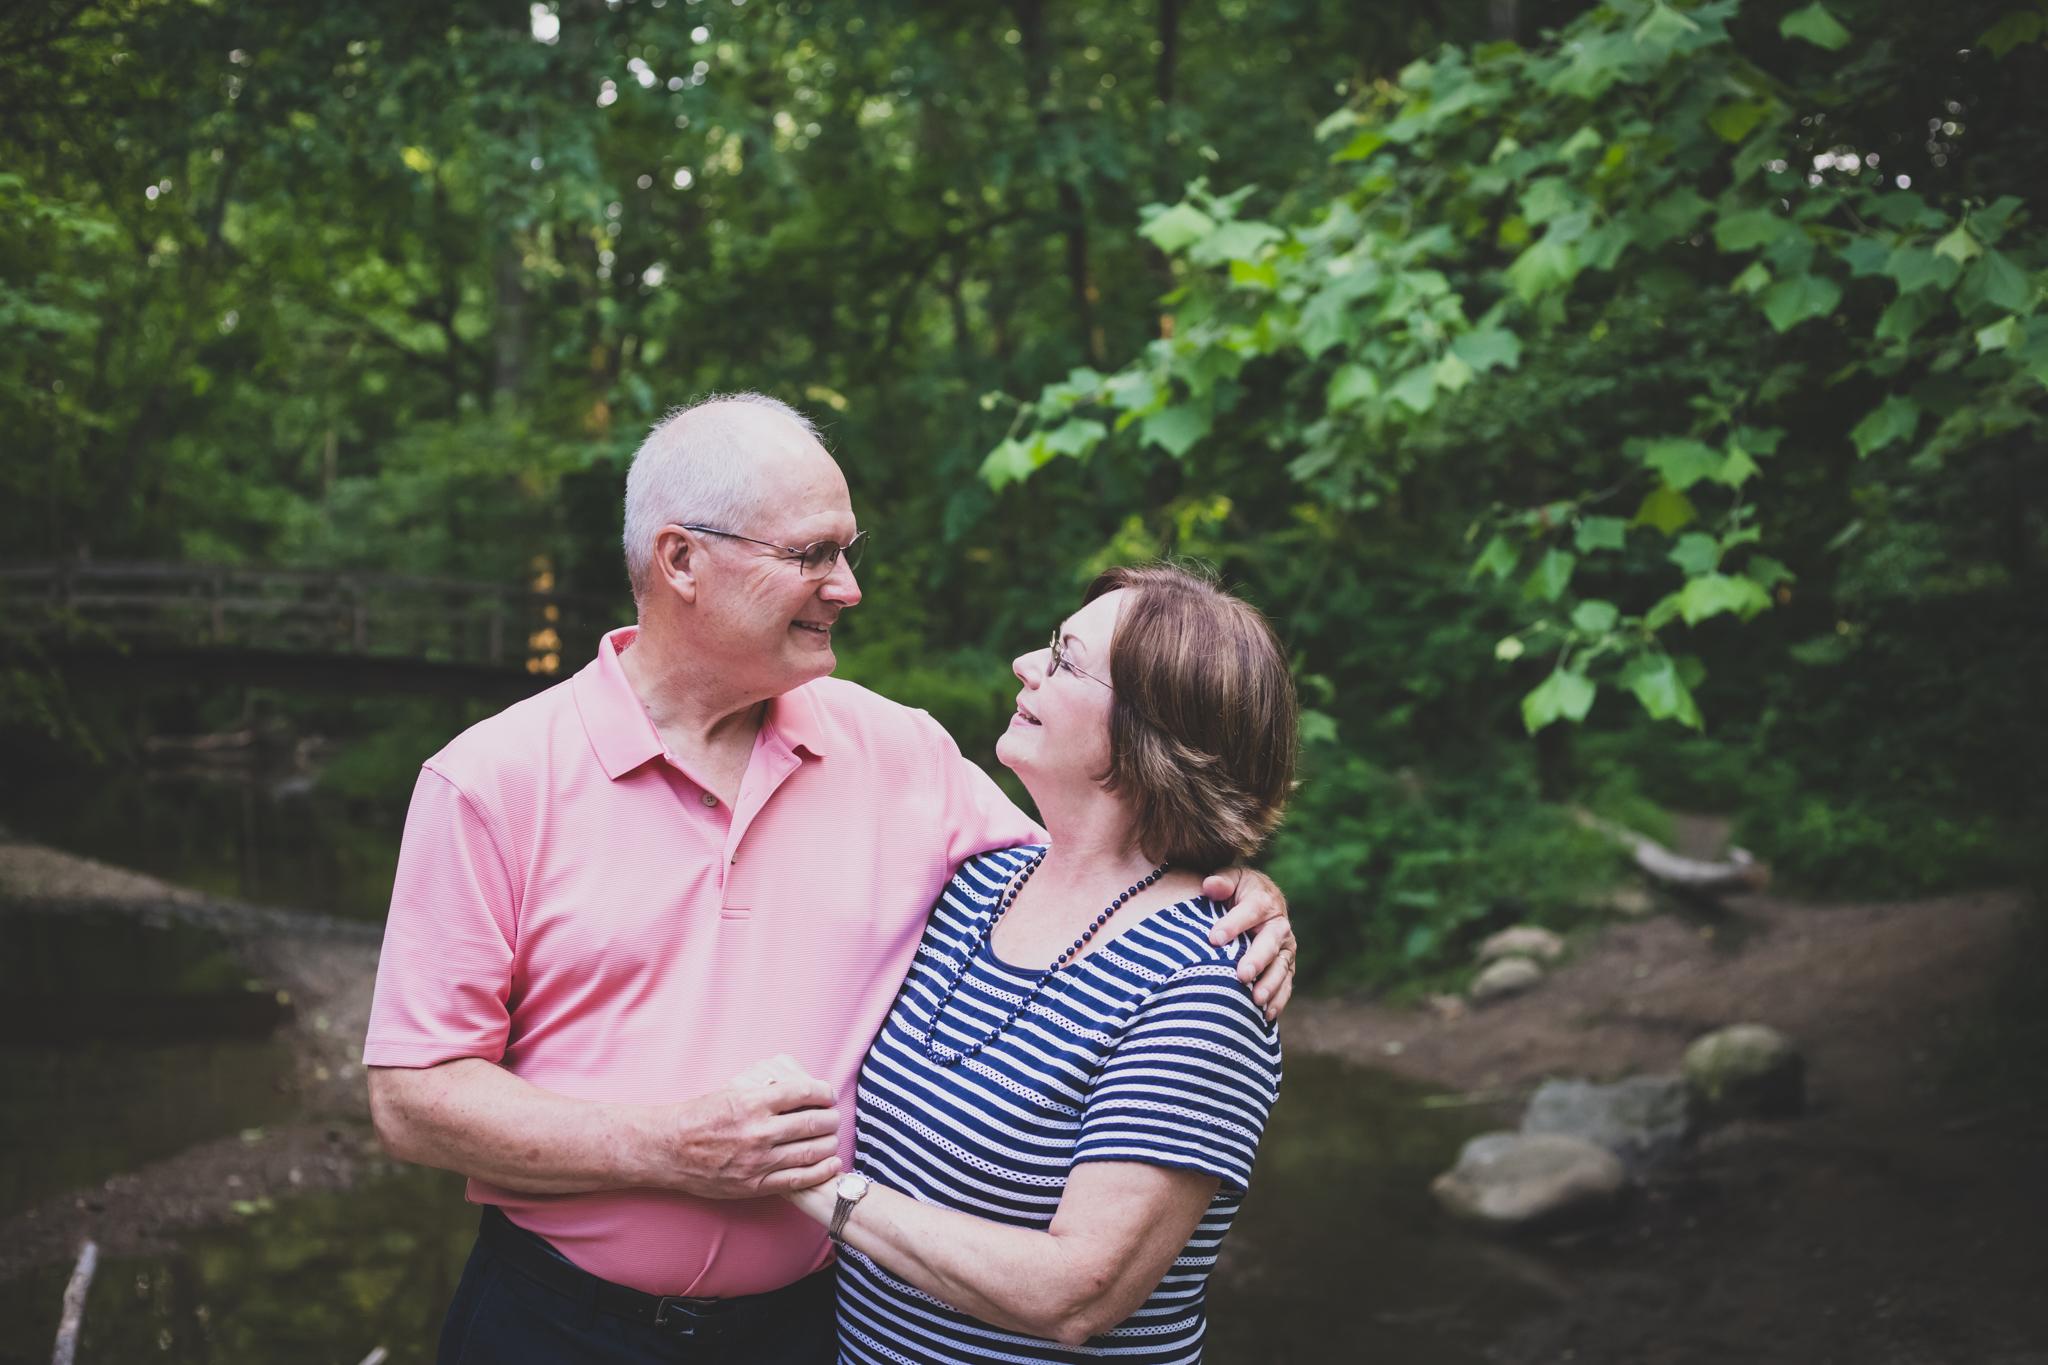 Michelle Carter Photography-Family Photo Shoot-34.jpg